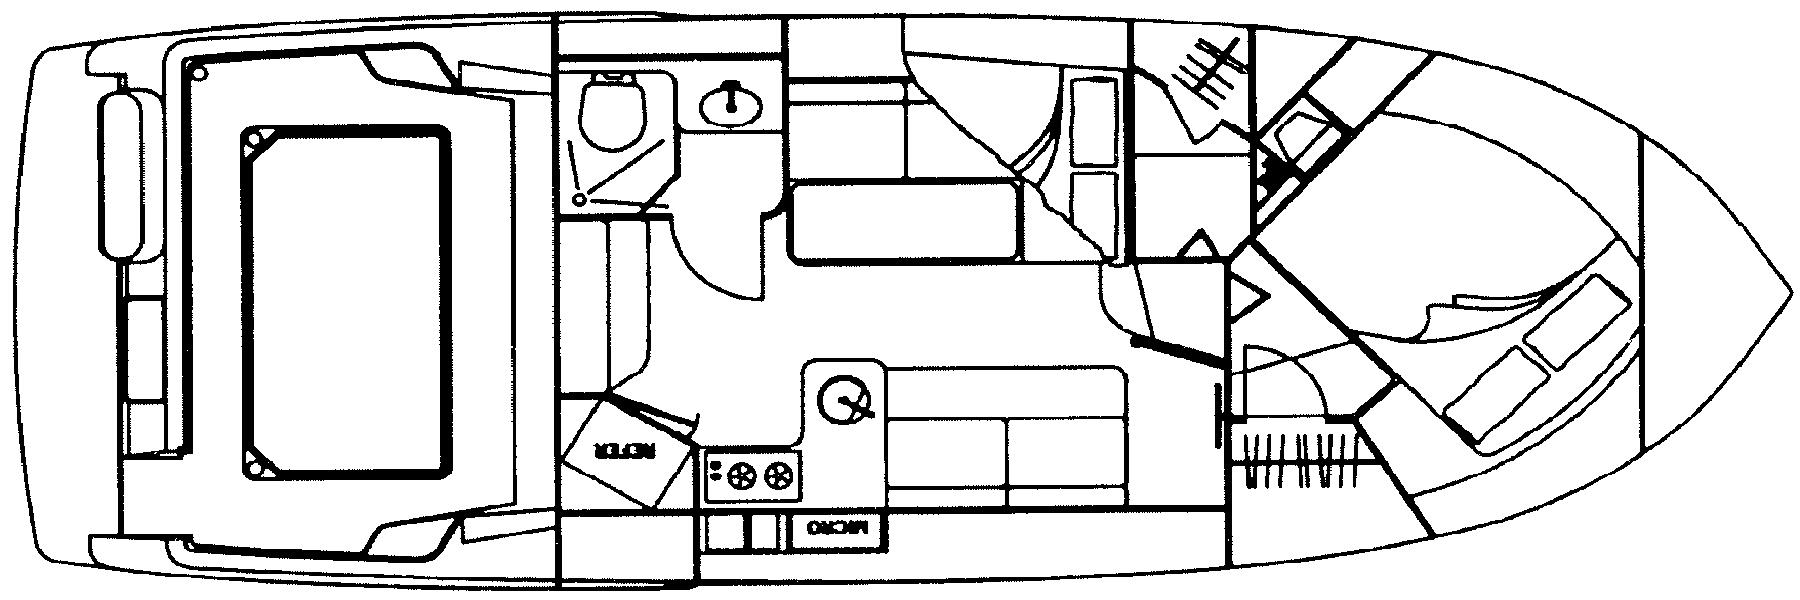 Carver 320 Voyager Floor Plan 2